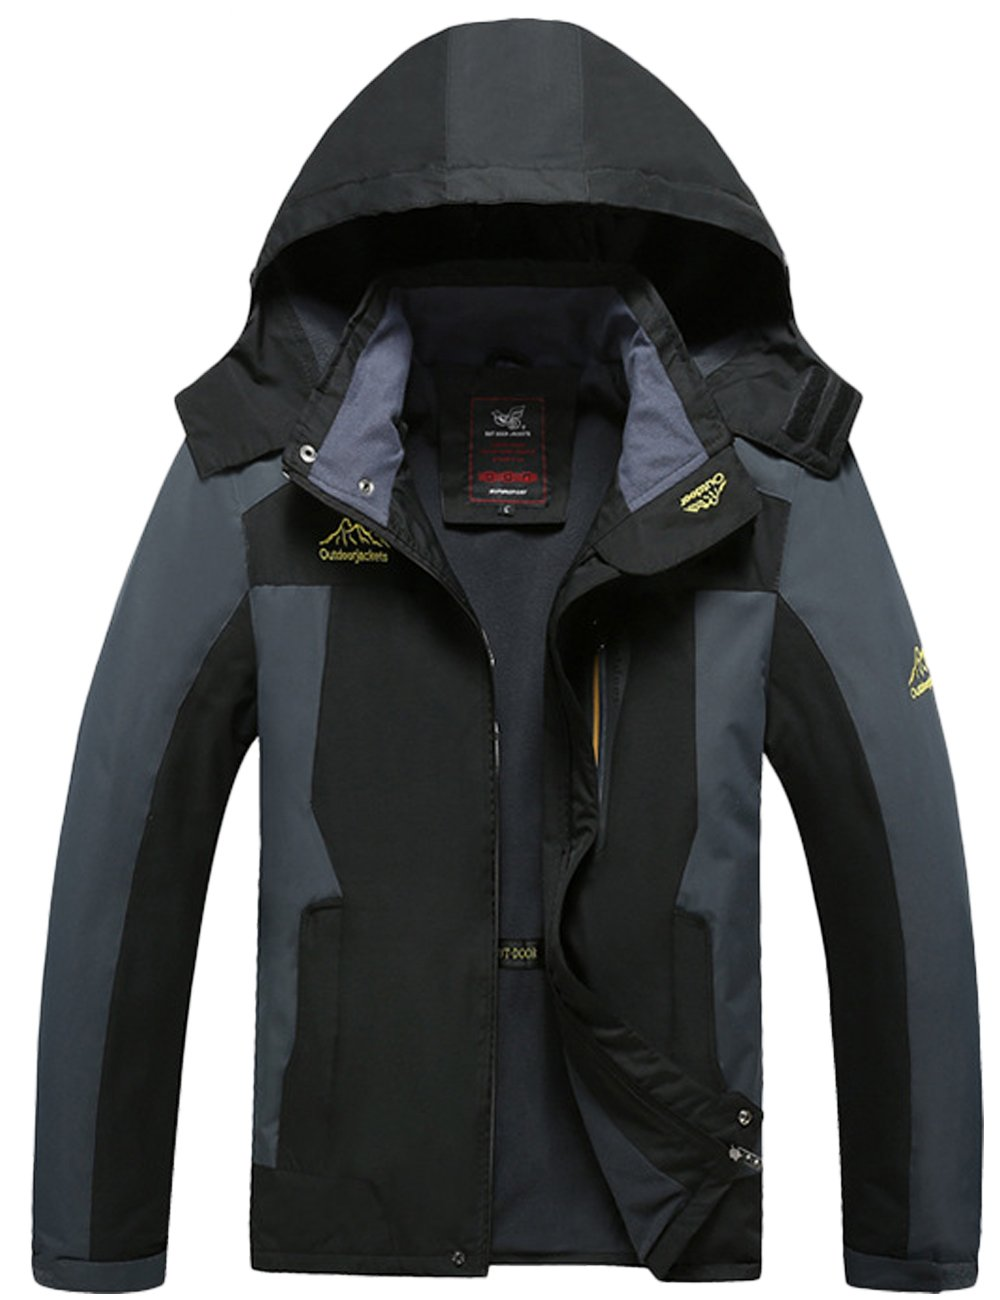 Menschwear OUTERWEAR メンズ B076JHZDHG S|Black 8828 Black 8828 S